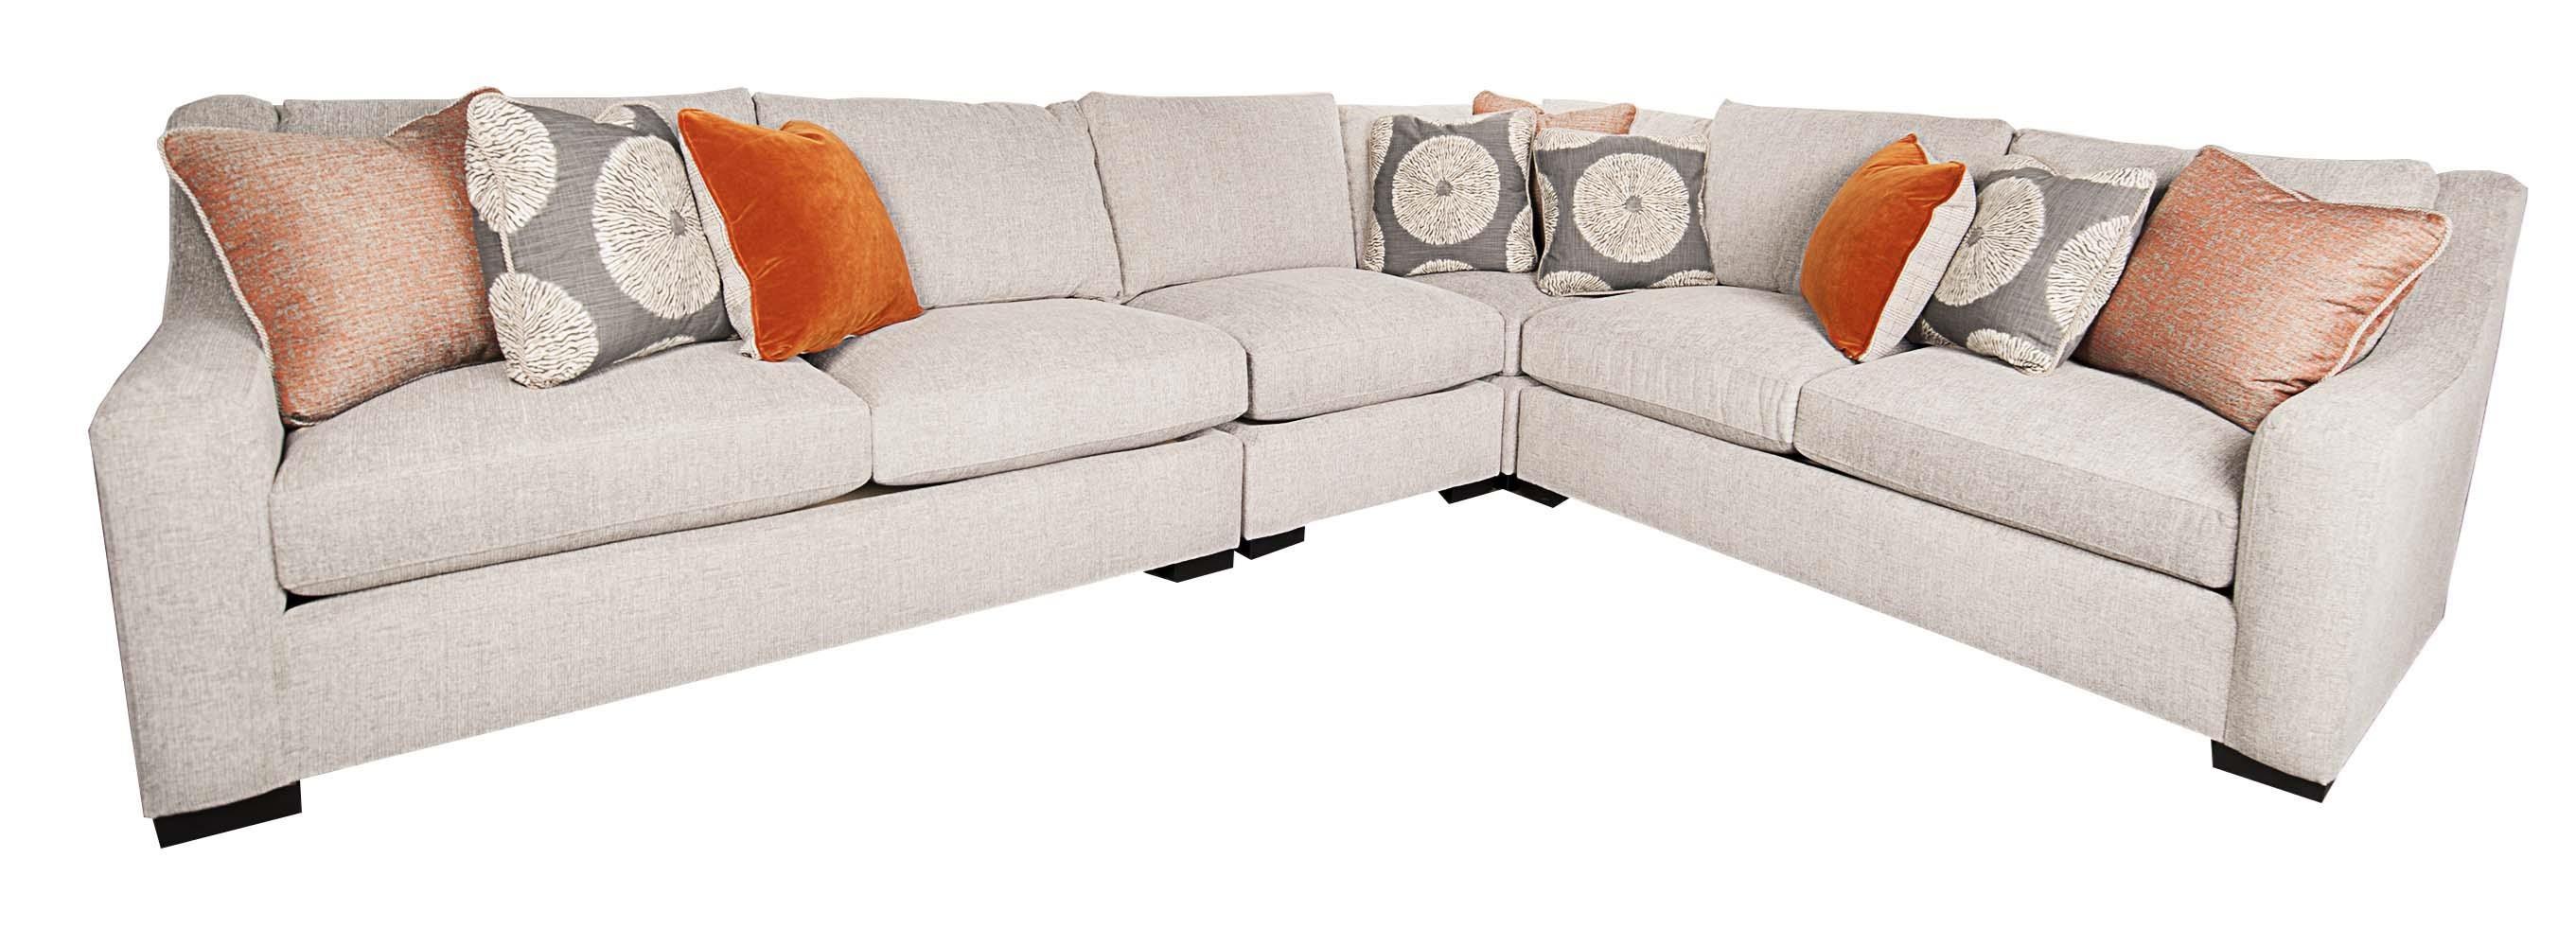 Bernhardt Germain 4 Piece Sectional Morris Home Sectional Sofas